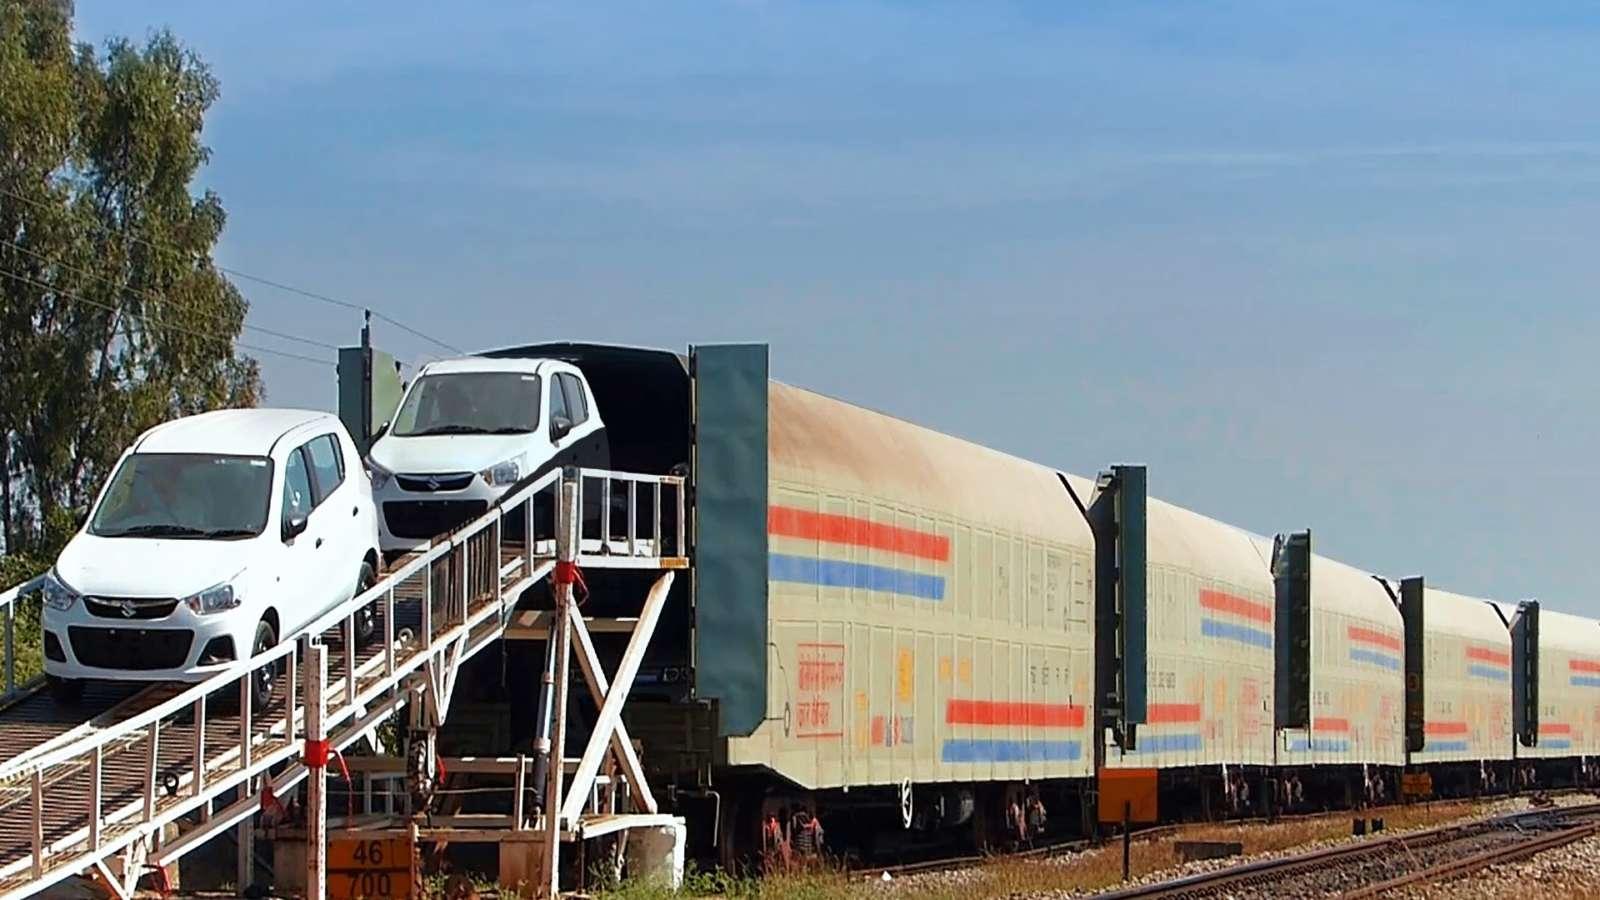 Auto Express train